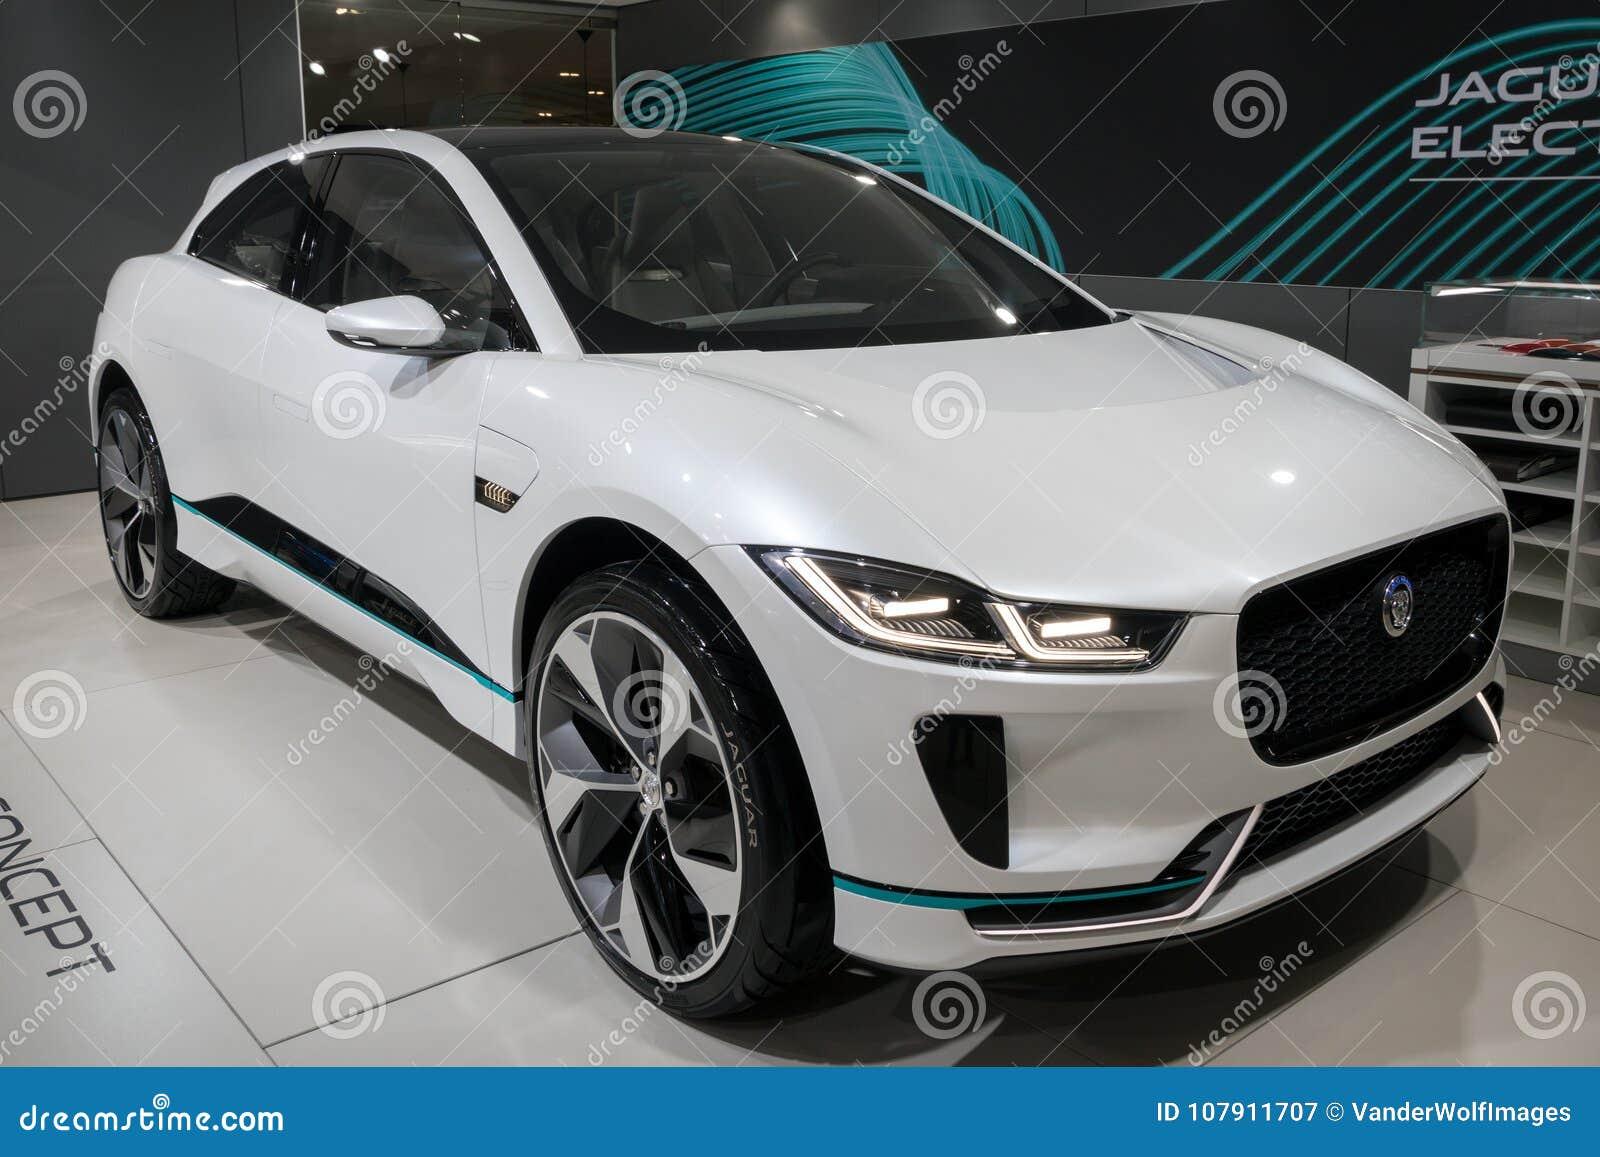 2018 Jaguar I Tempo Elektrische Suv Auto Redactionele Fotografie